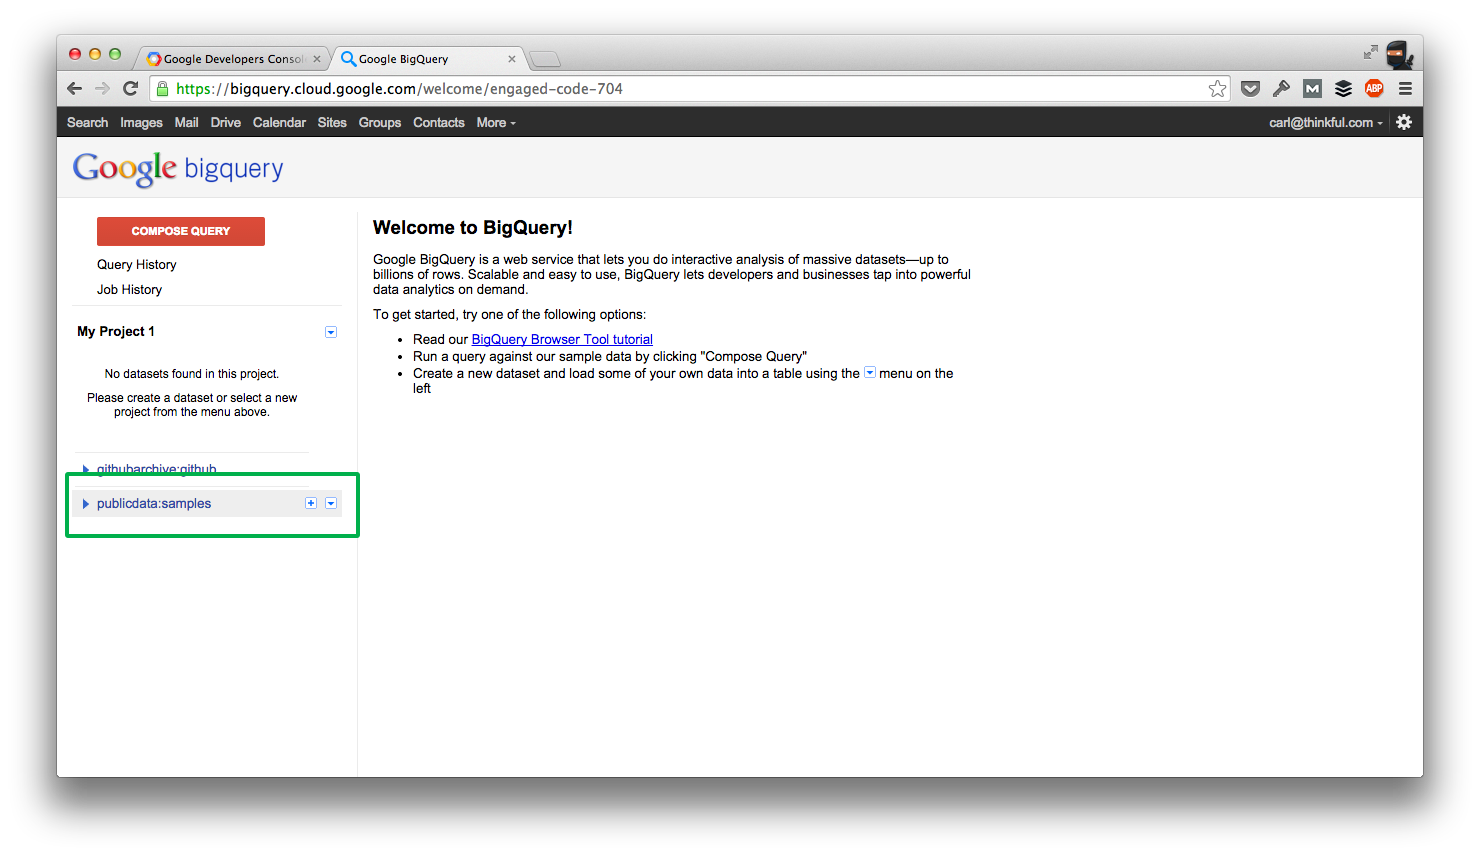 GitHub - Thinkful/guide-google-bigquery: An intro to Google